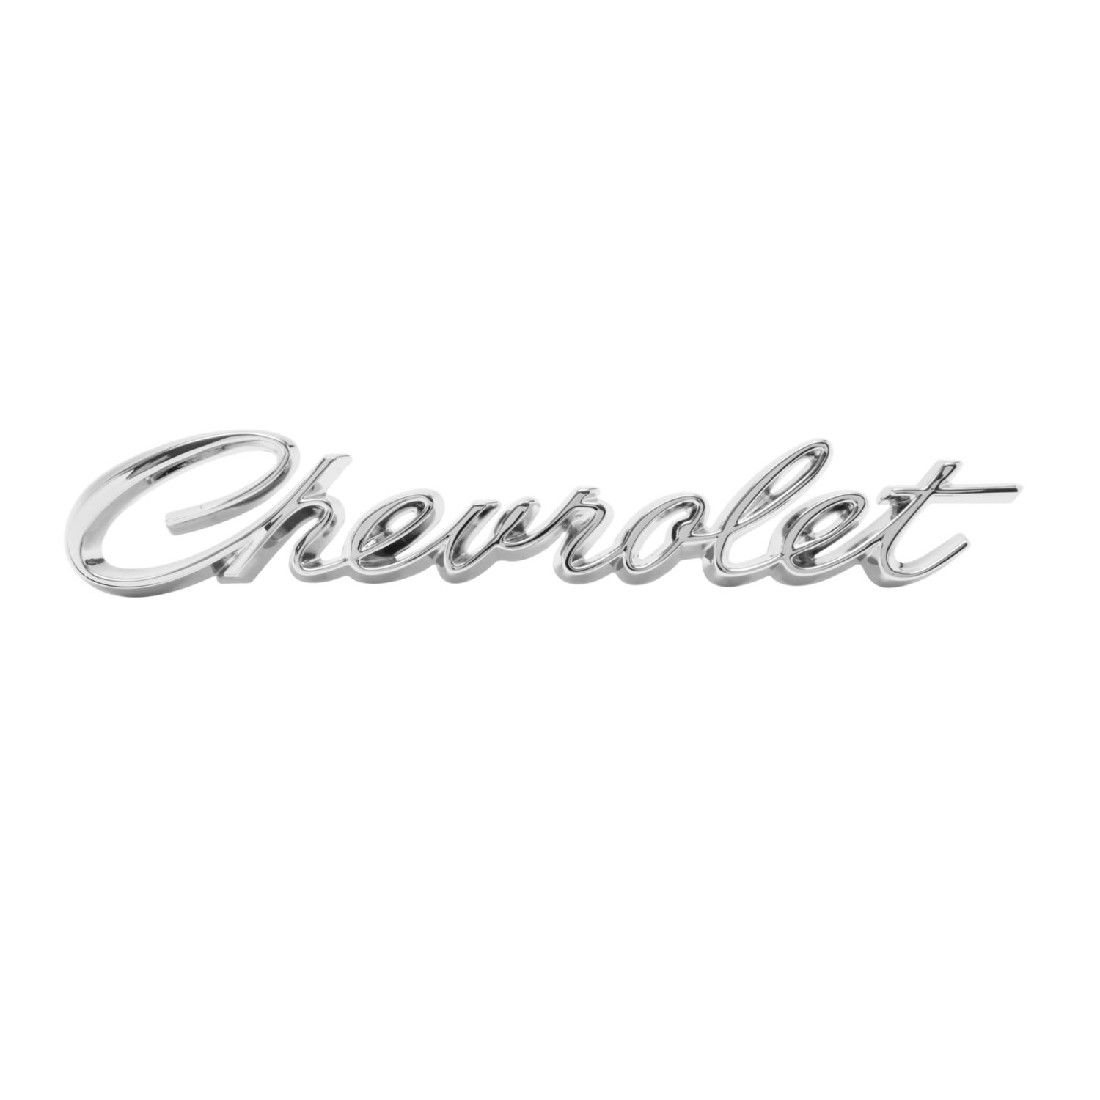 Chevrolet Chevrolet Tail Gate Emblem